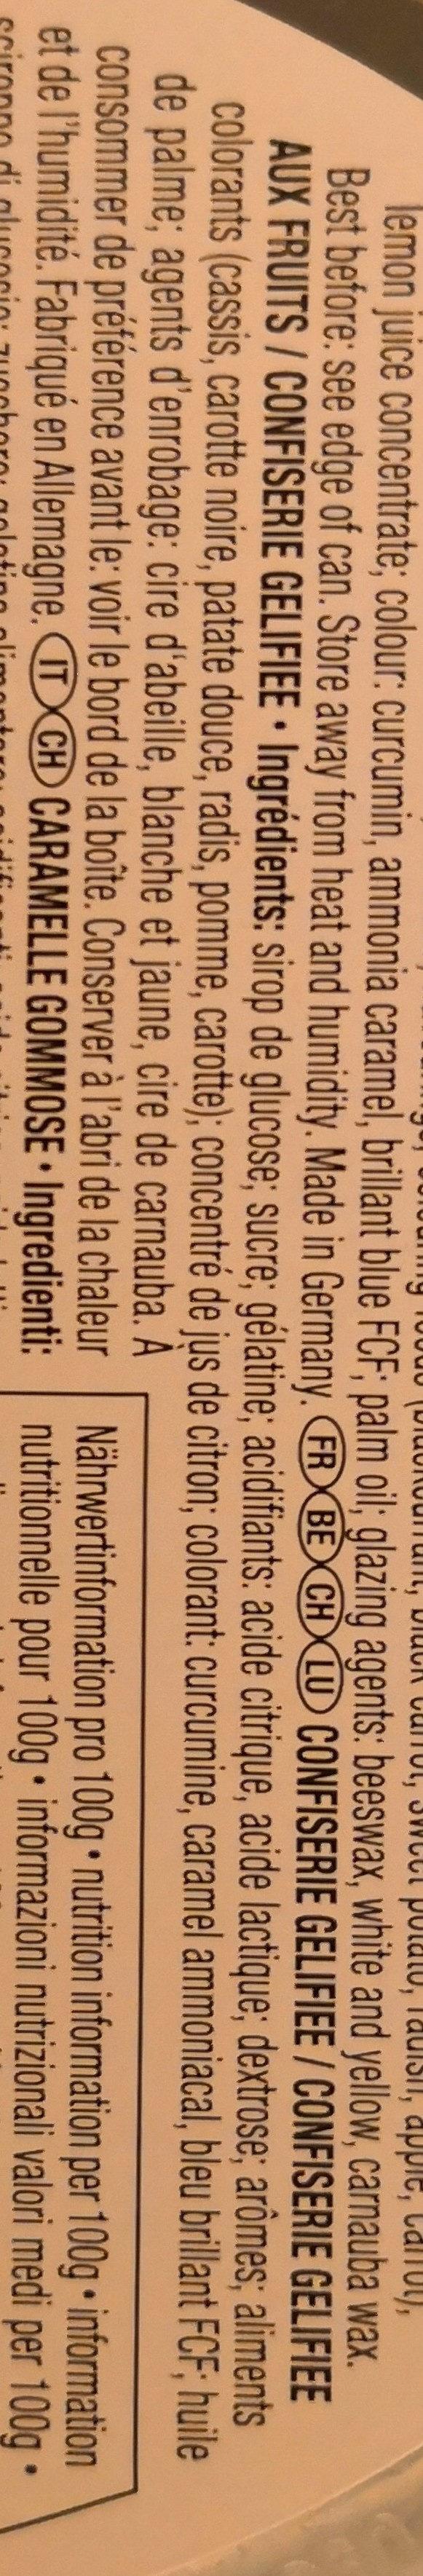 Trolli No. 1 Bunte Fruchtgummi- Mischung - Ingredienti - fr